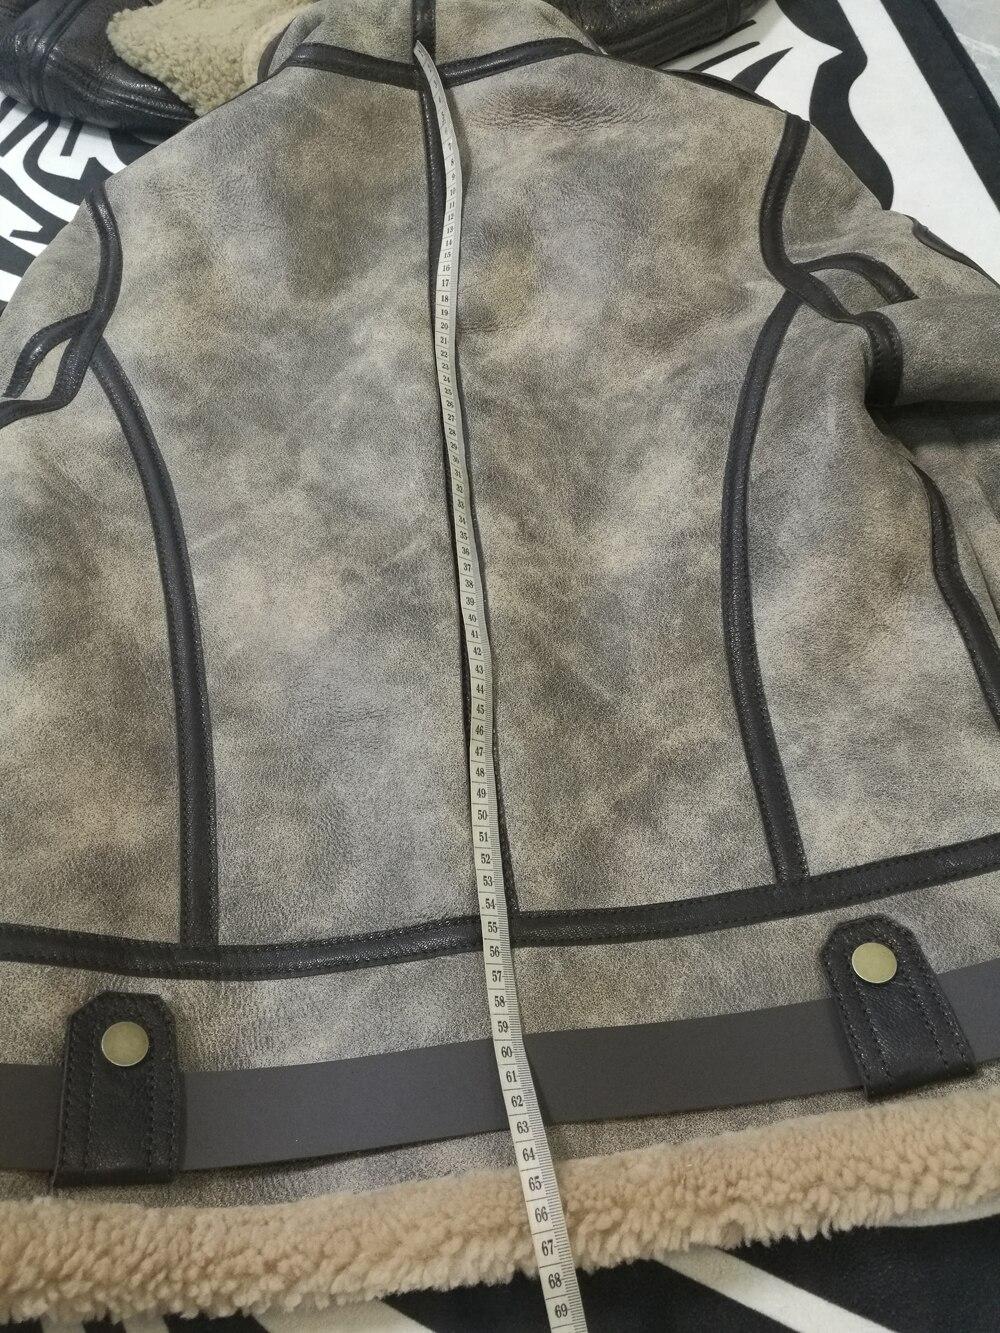 Hd5d3f3f91dfc4feb9825522621844af7a 2019 Fashion 100% Quality Real Sheepskin Fur Men Coat Genuine Full Pelt Sheep Shearling Male Winter Jacket Brown Men Fur Outwear